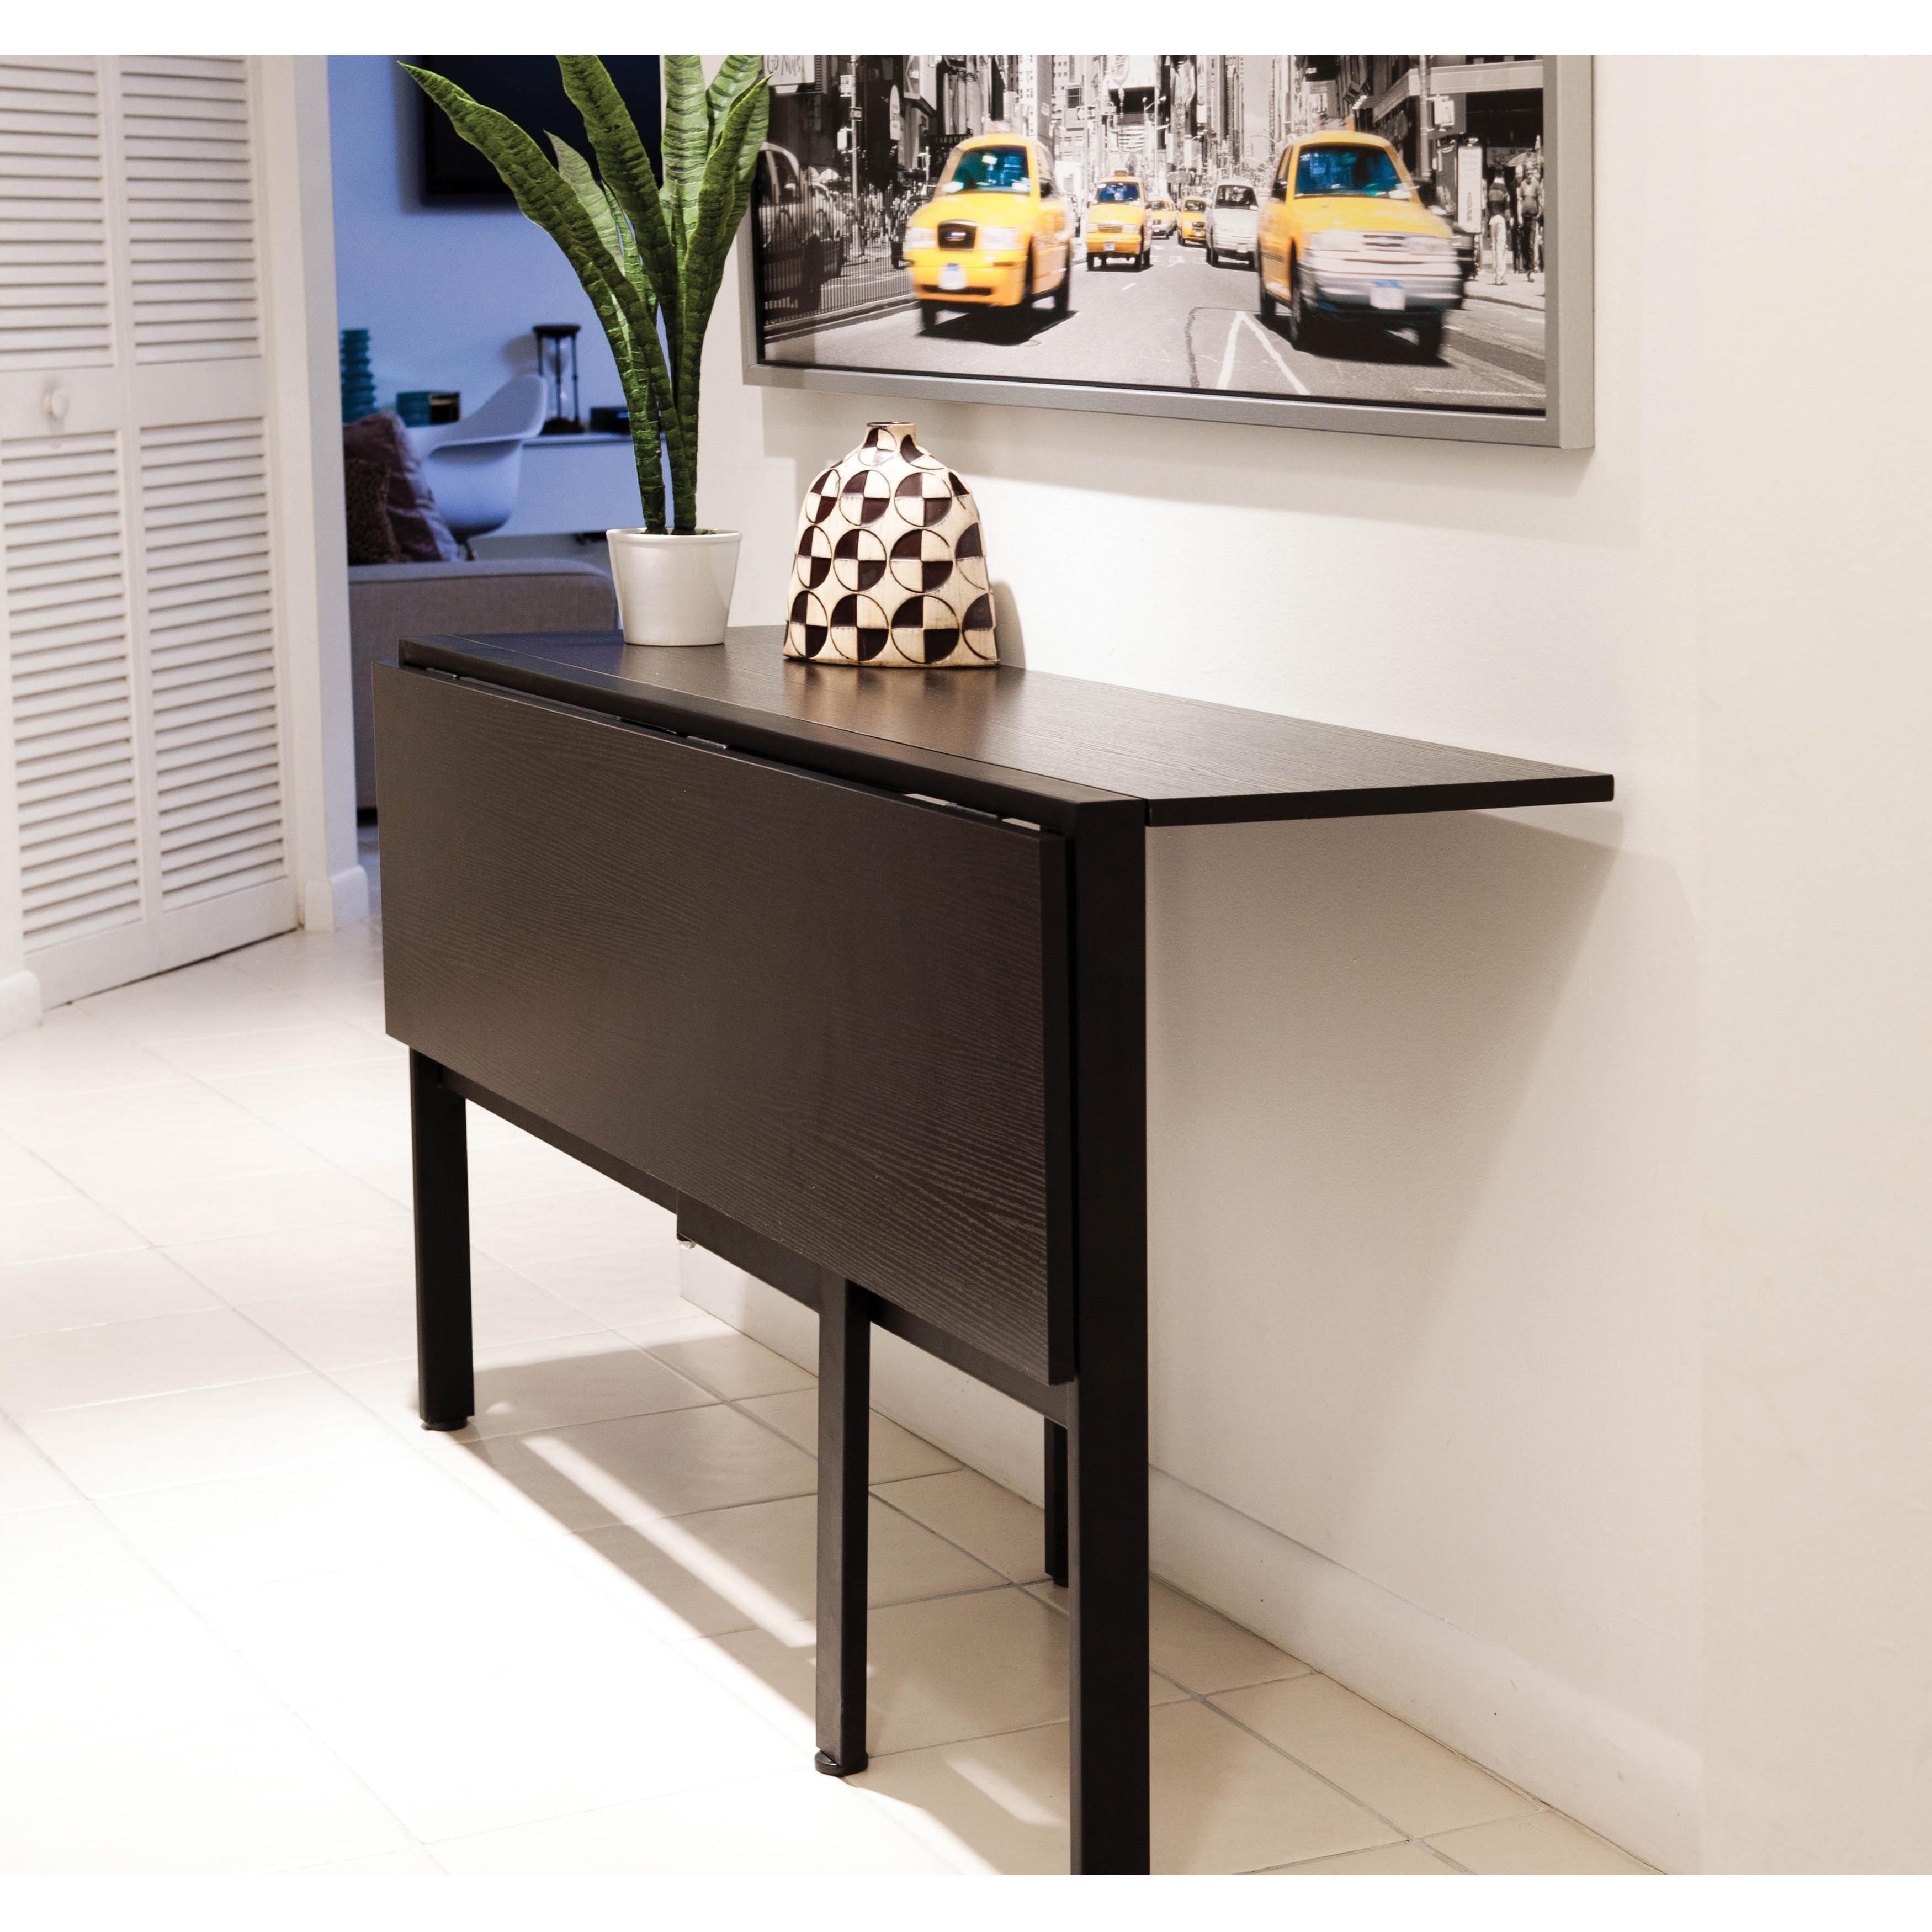 Image of: Shop Black Friday Deals On Drop Leaf Rectangle Dining Table On Sale Overstock 20254706